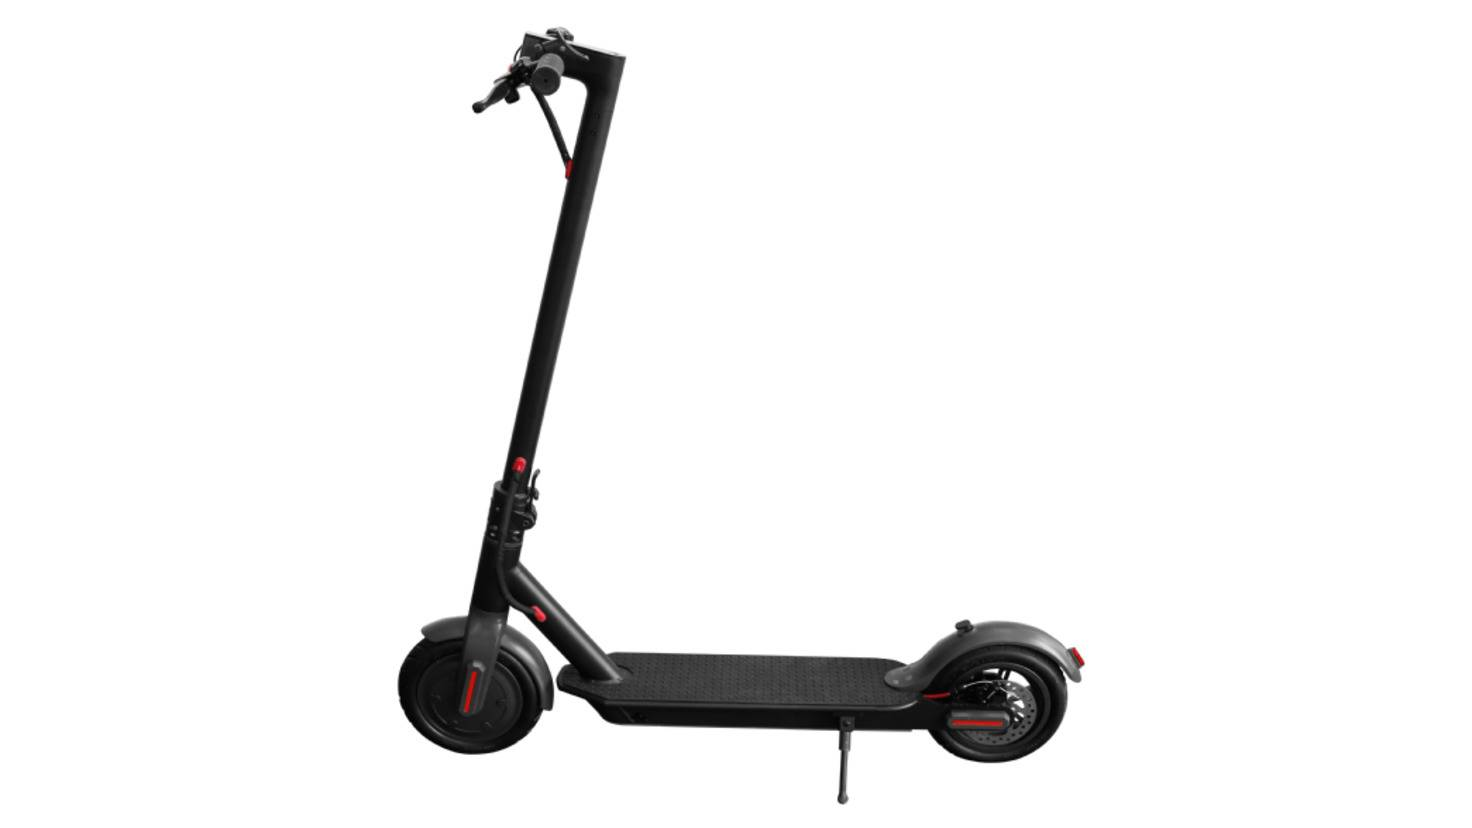 ICONBIT-IK-1969K-CITY-E-scooter